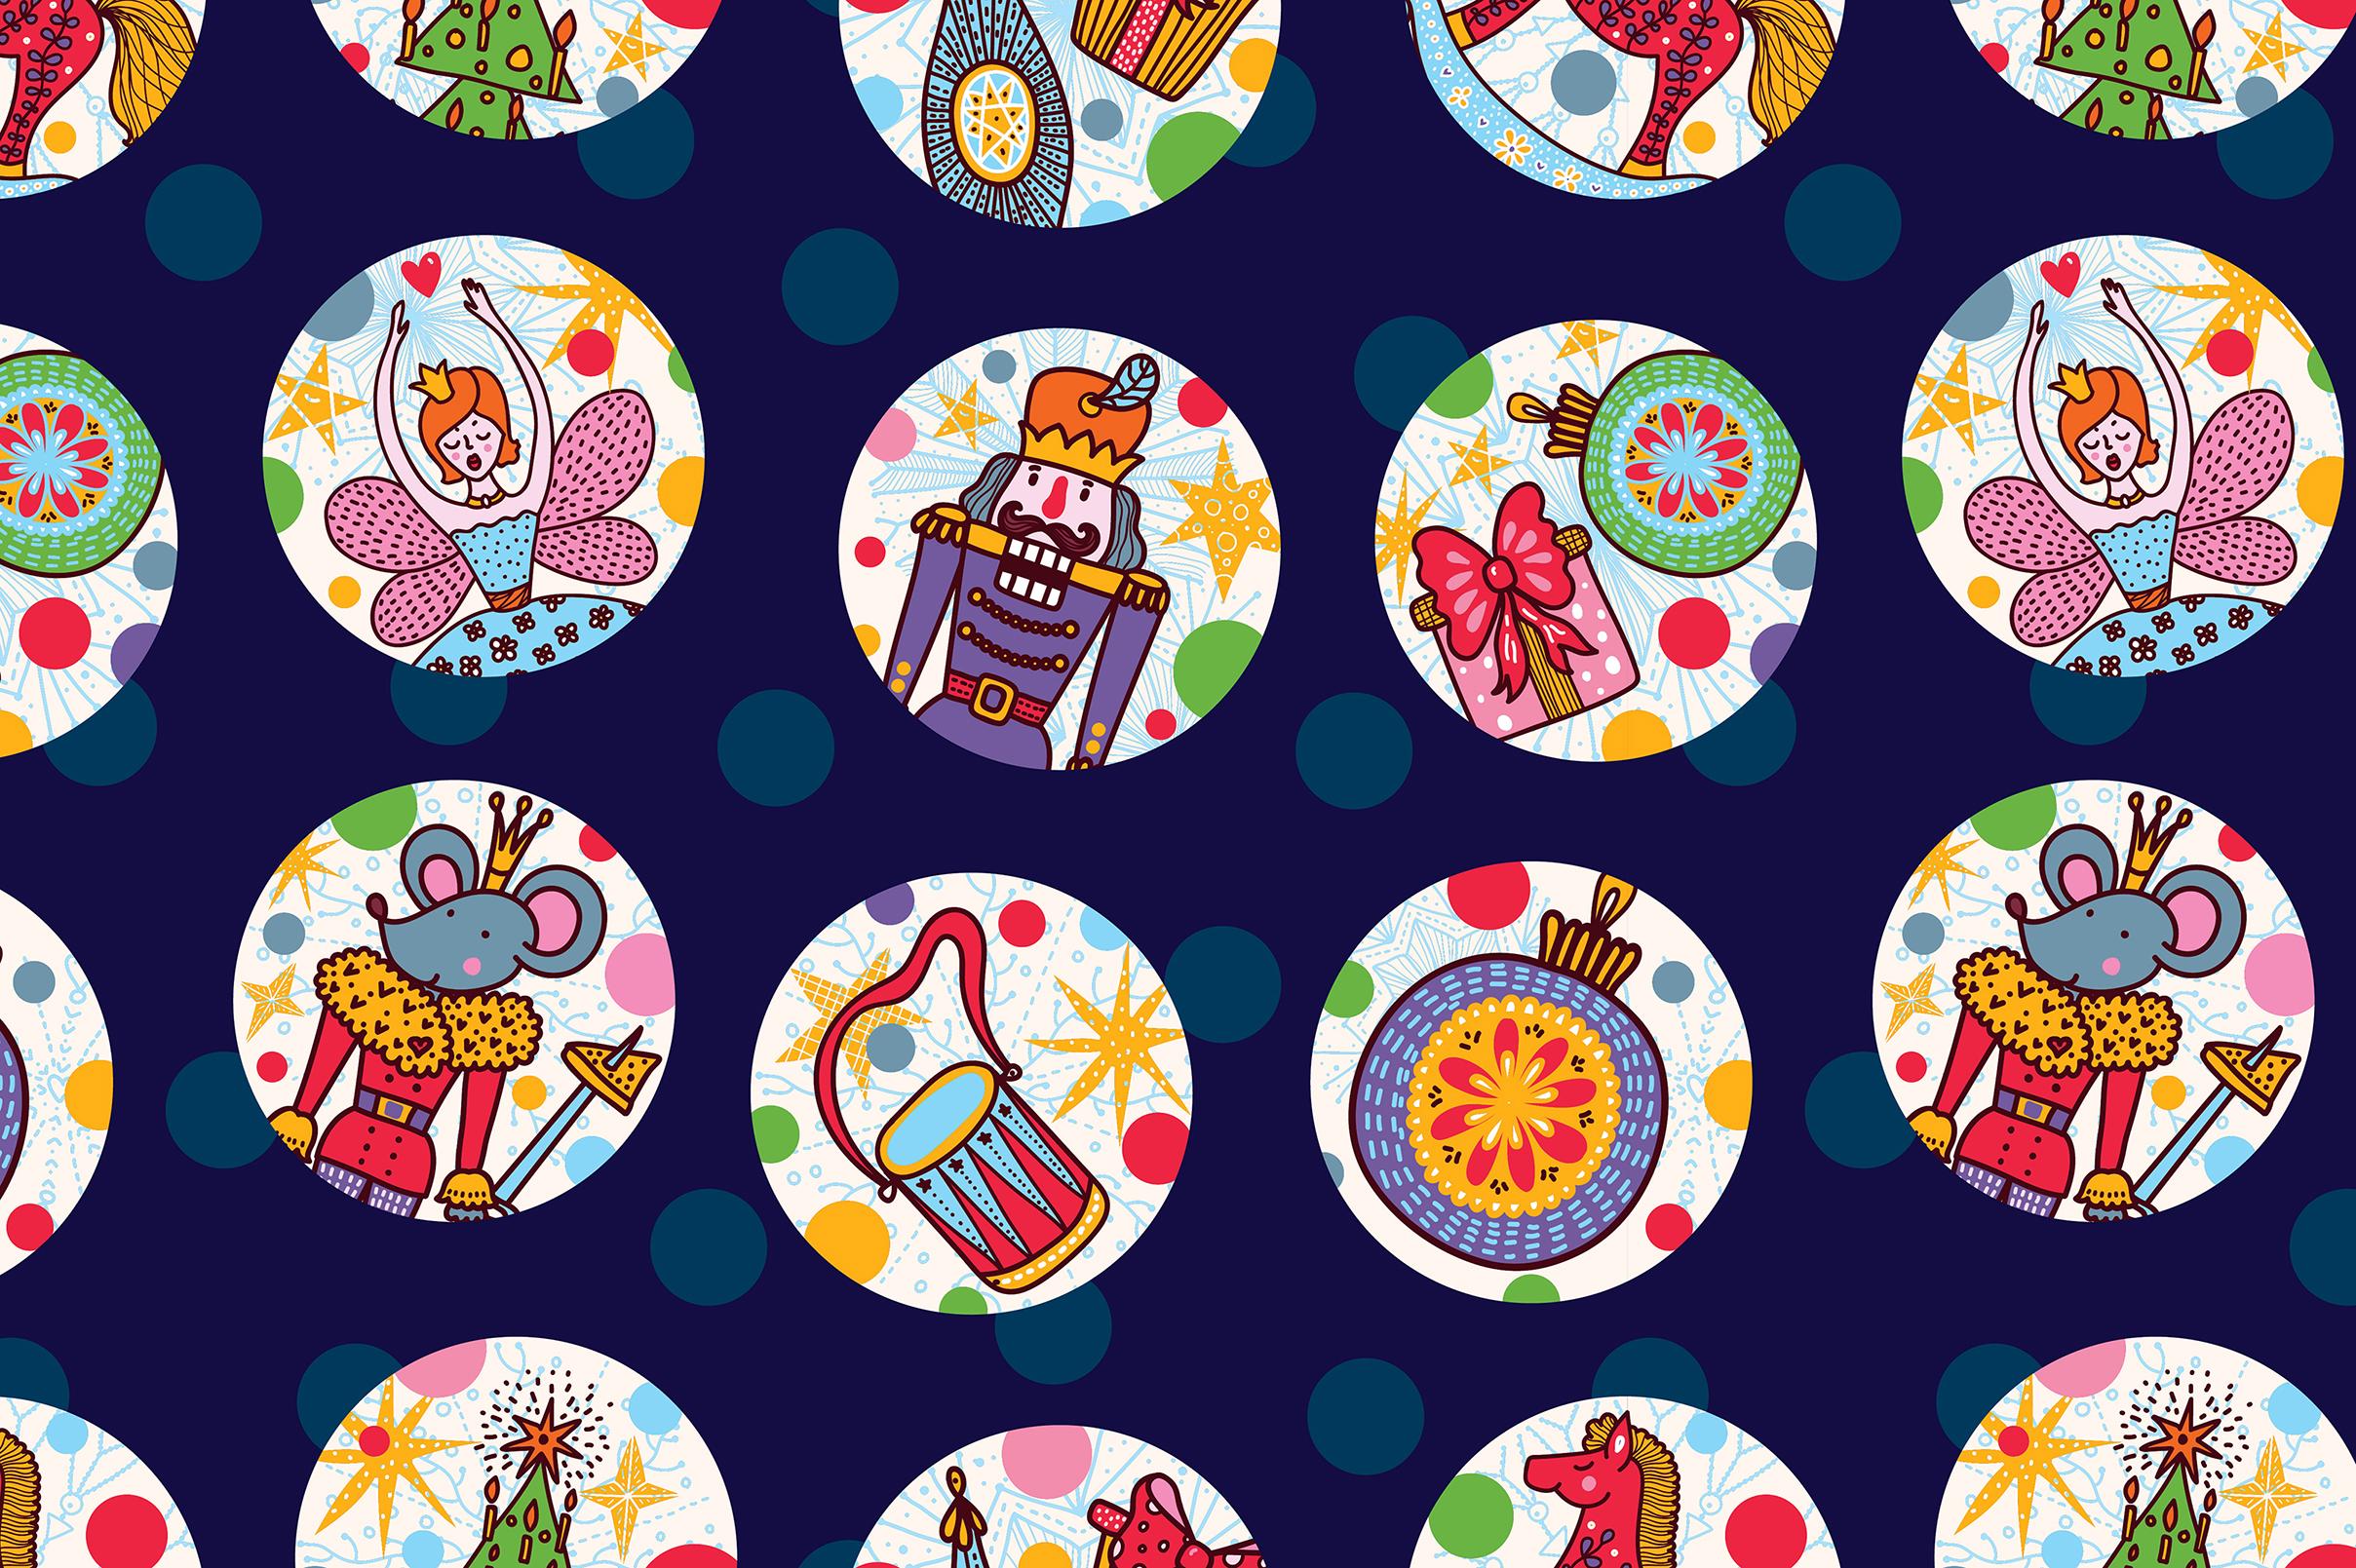 Nutcracker. Christmas story. example image 10